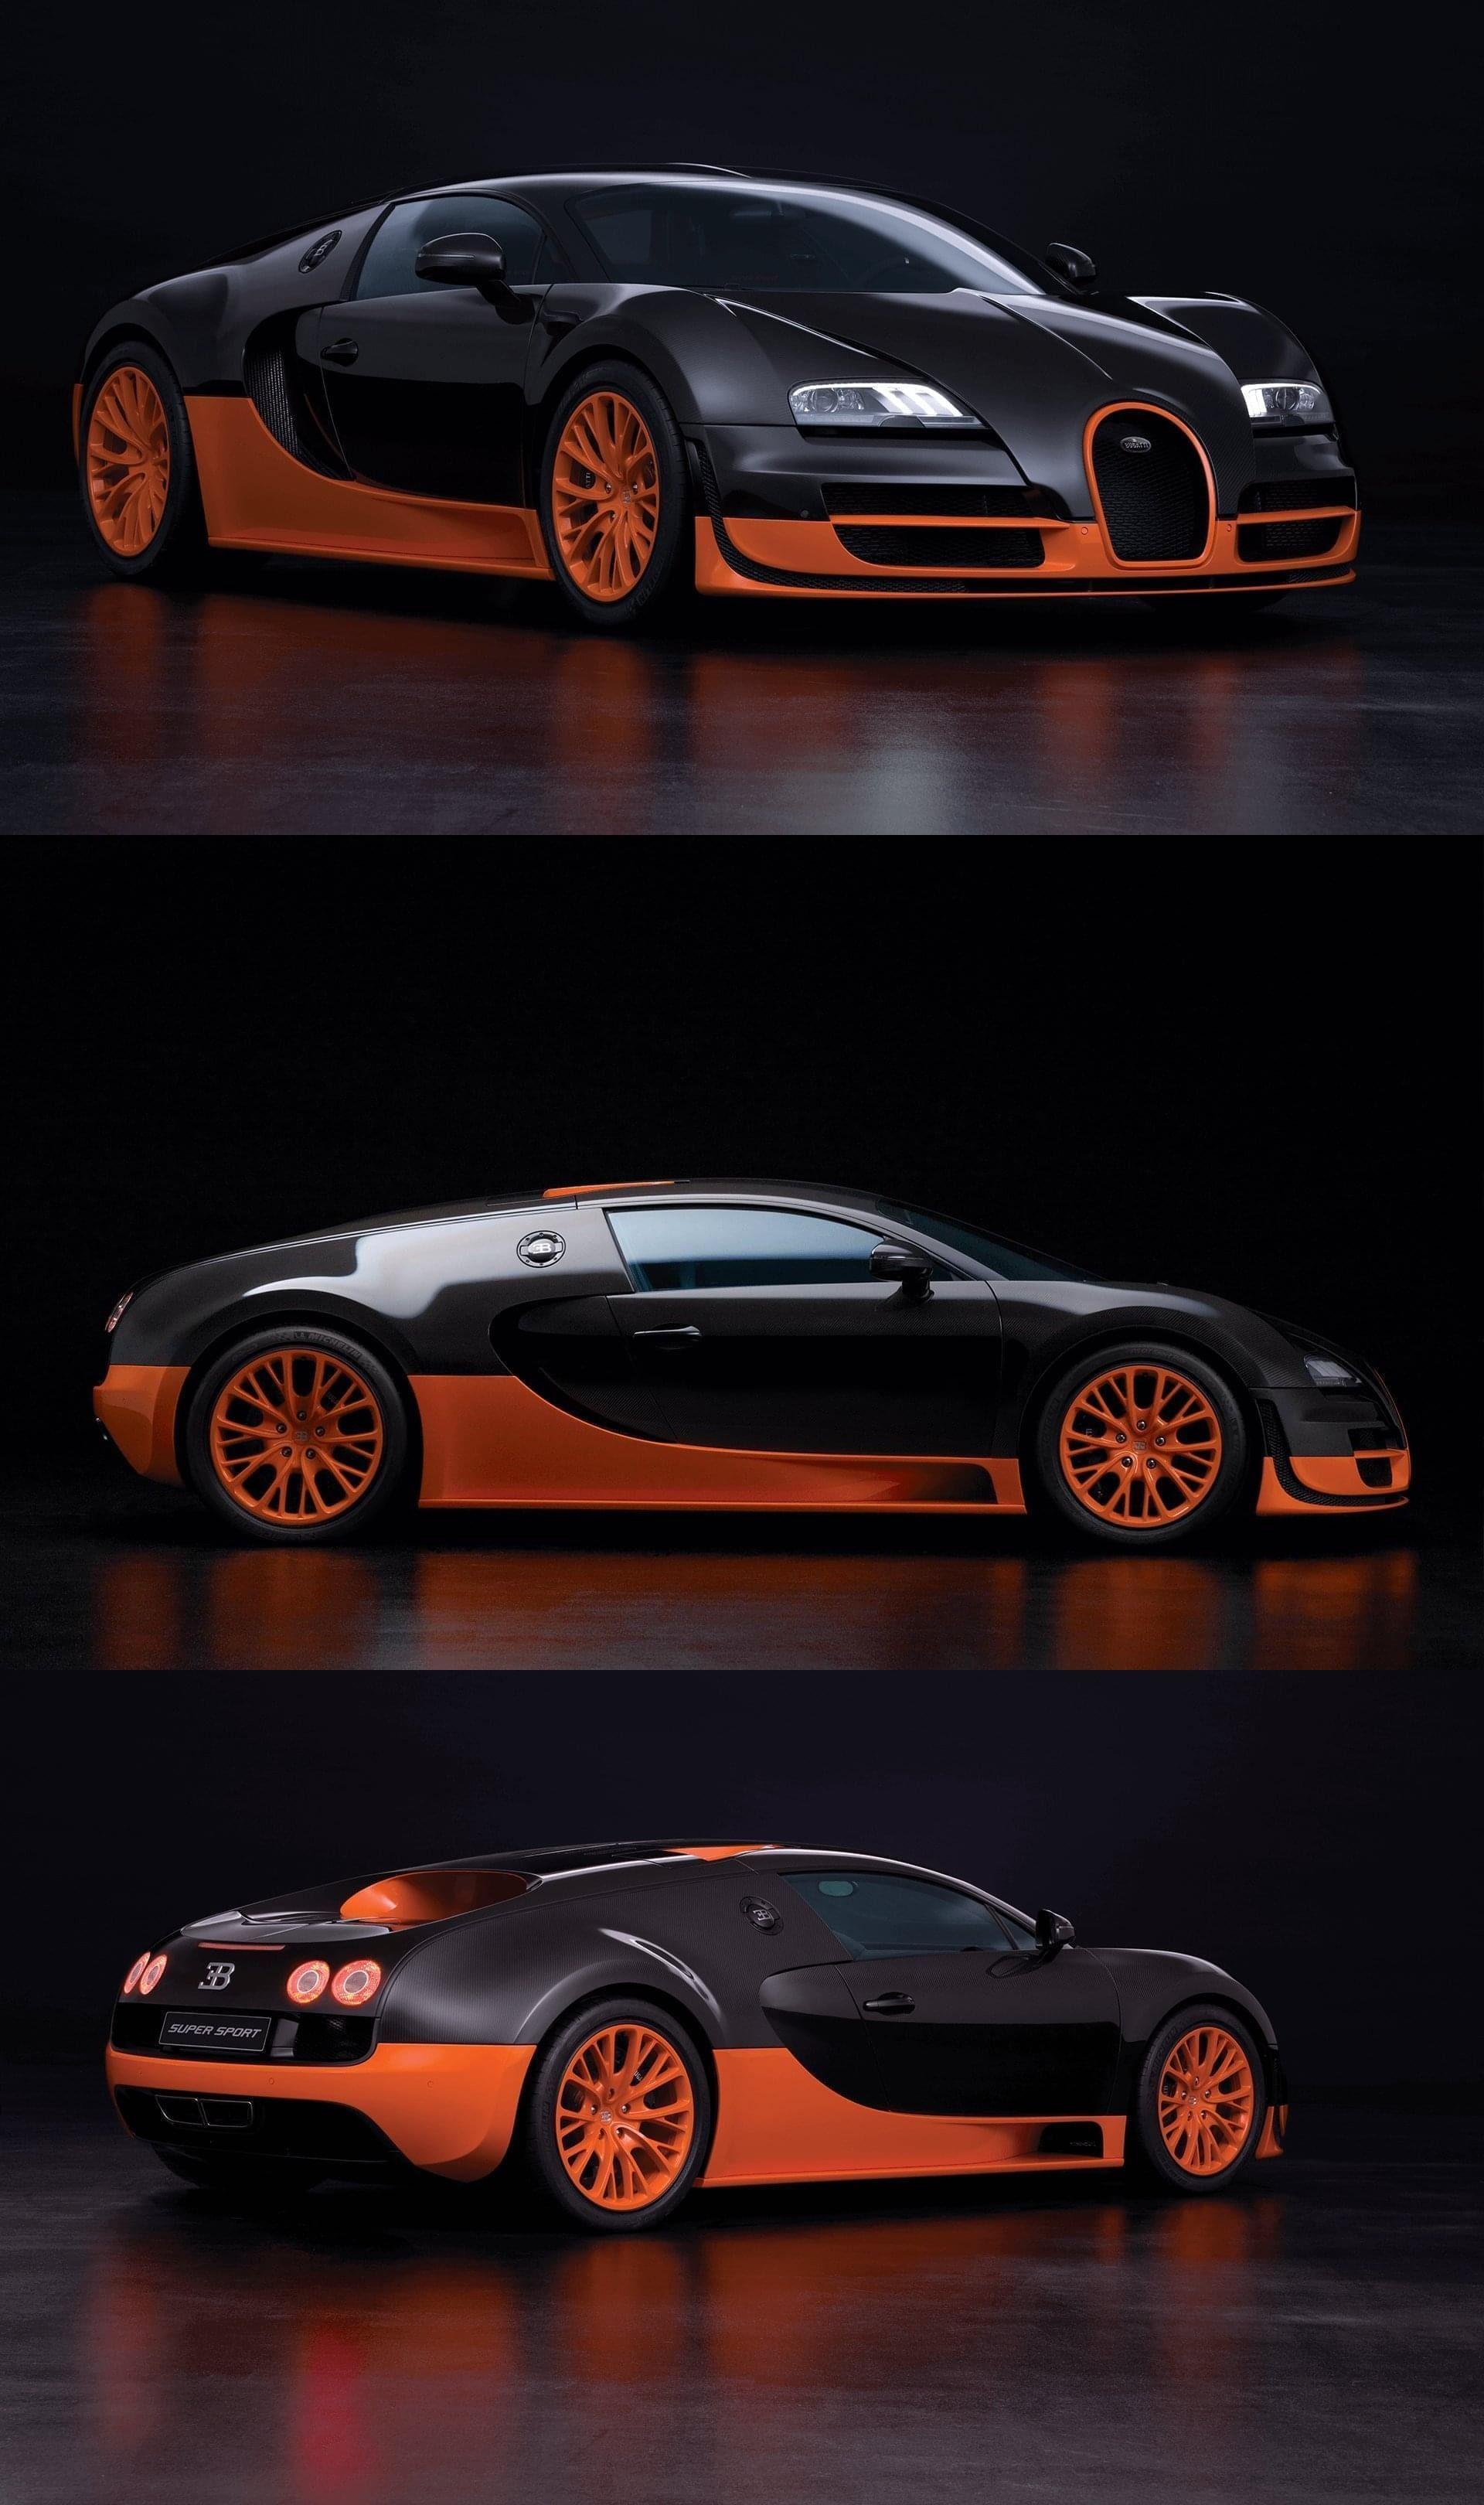 Model Power Mileage Safety Colors Bugatti Veyron Super Sport